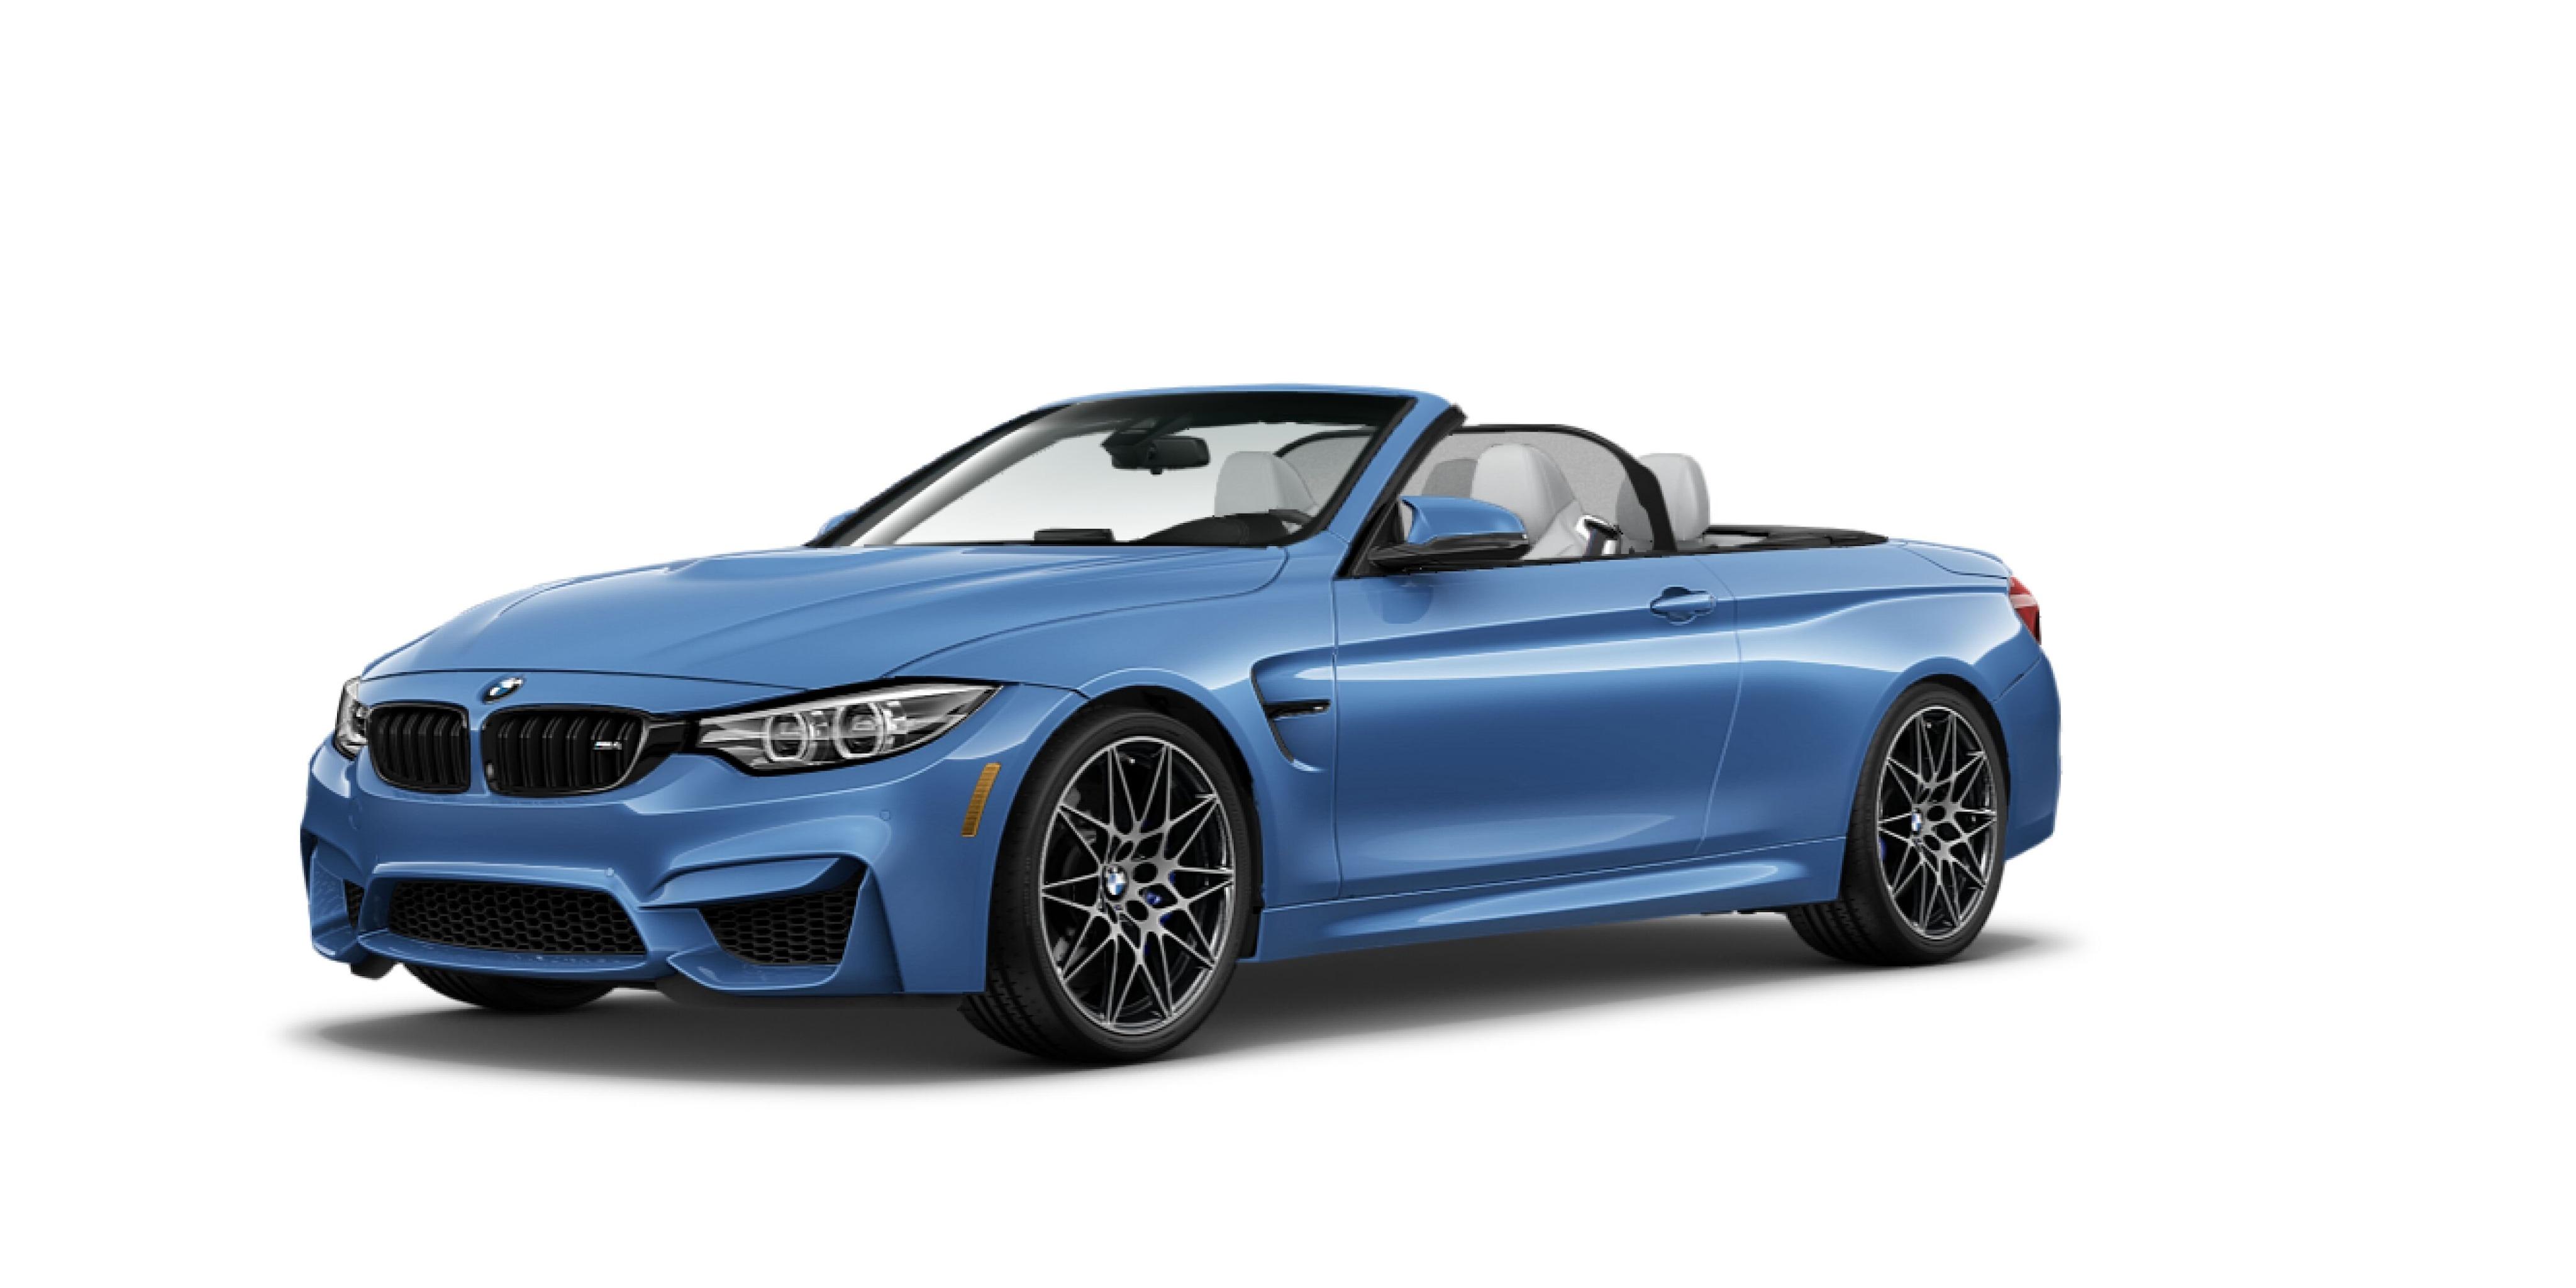 2020 BMW M4 Convertible Convertible